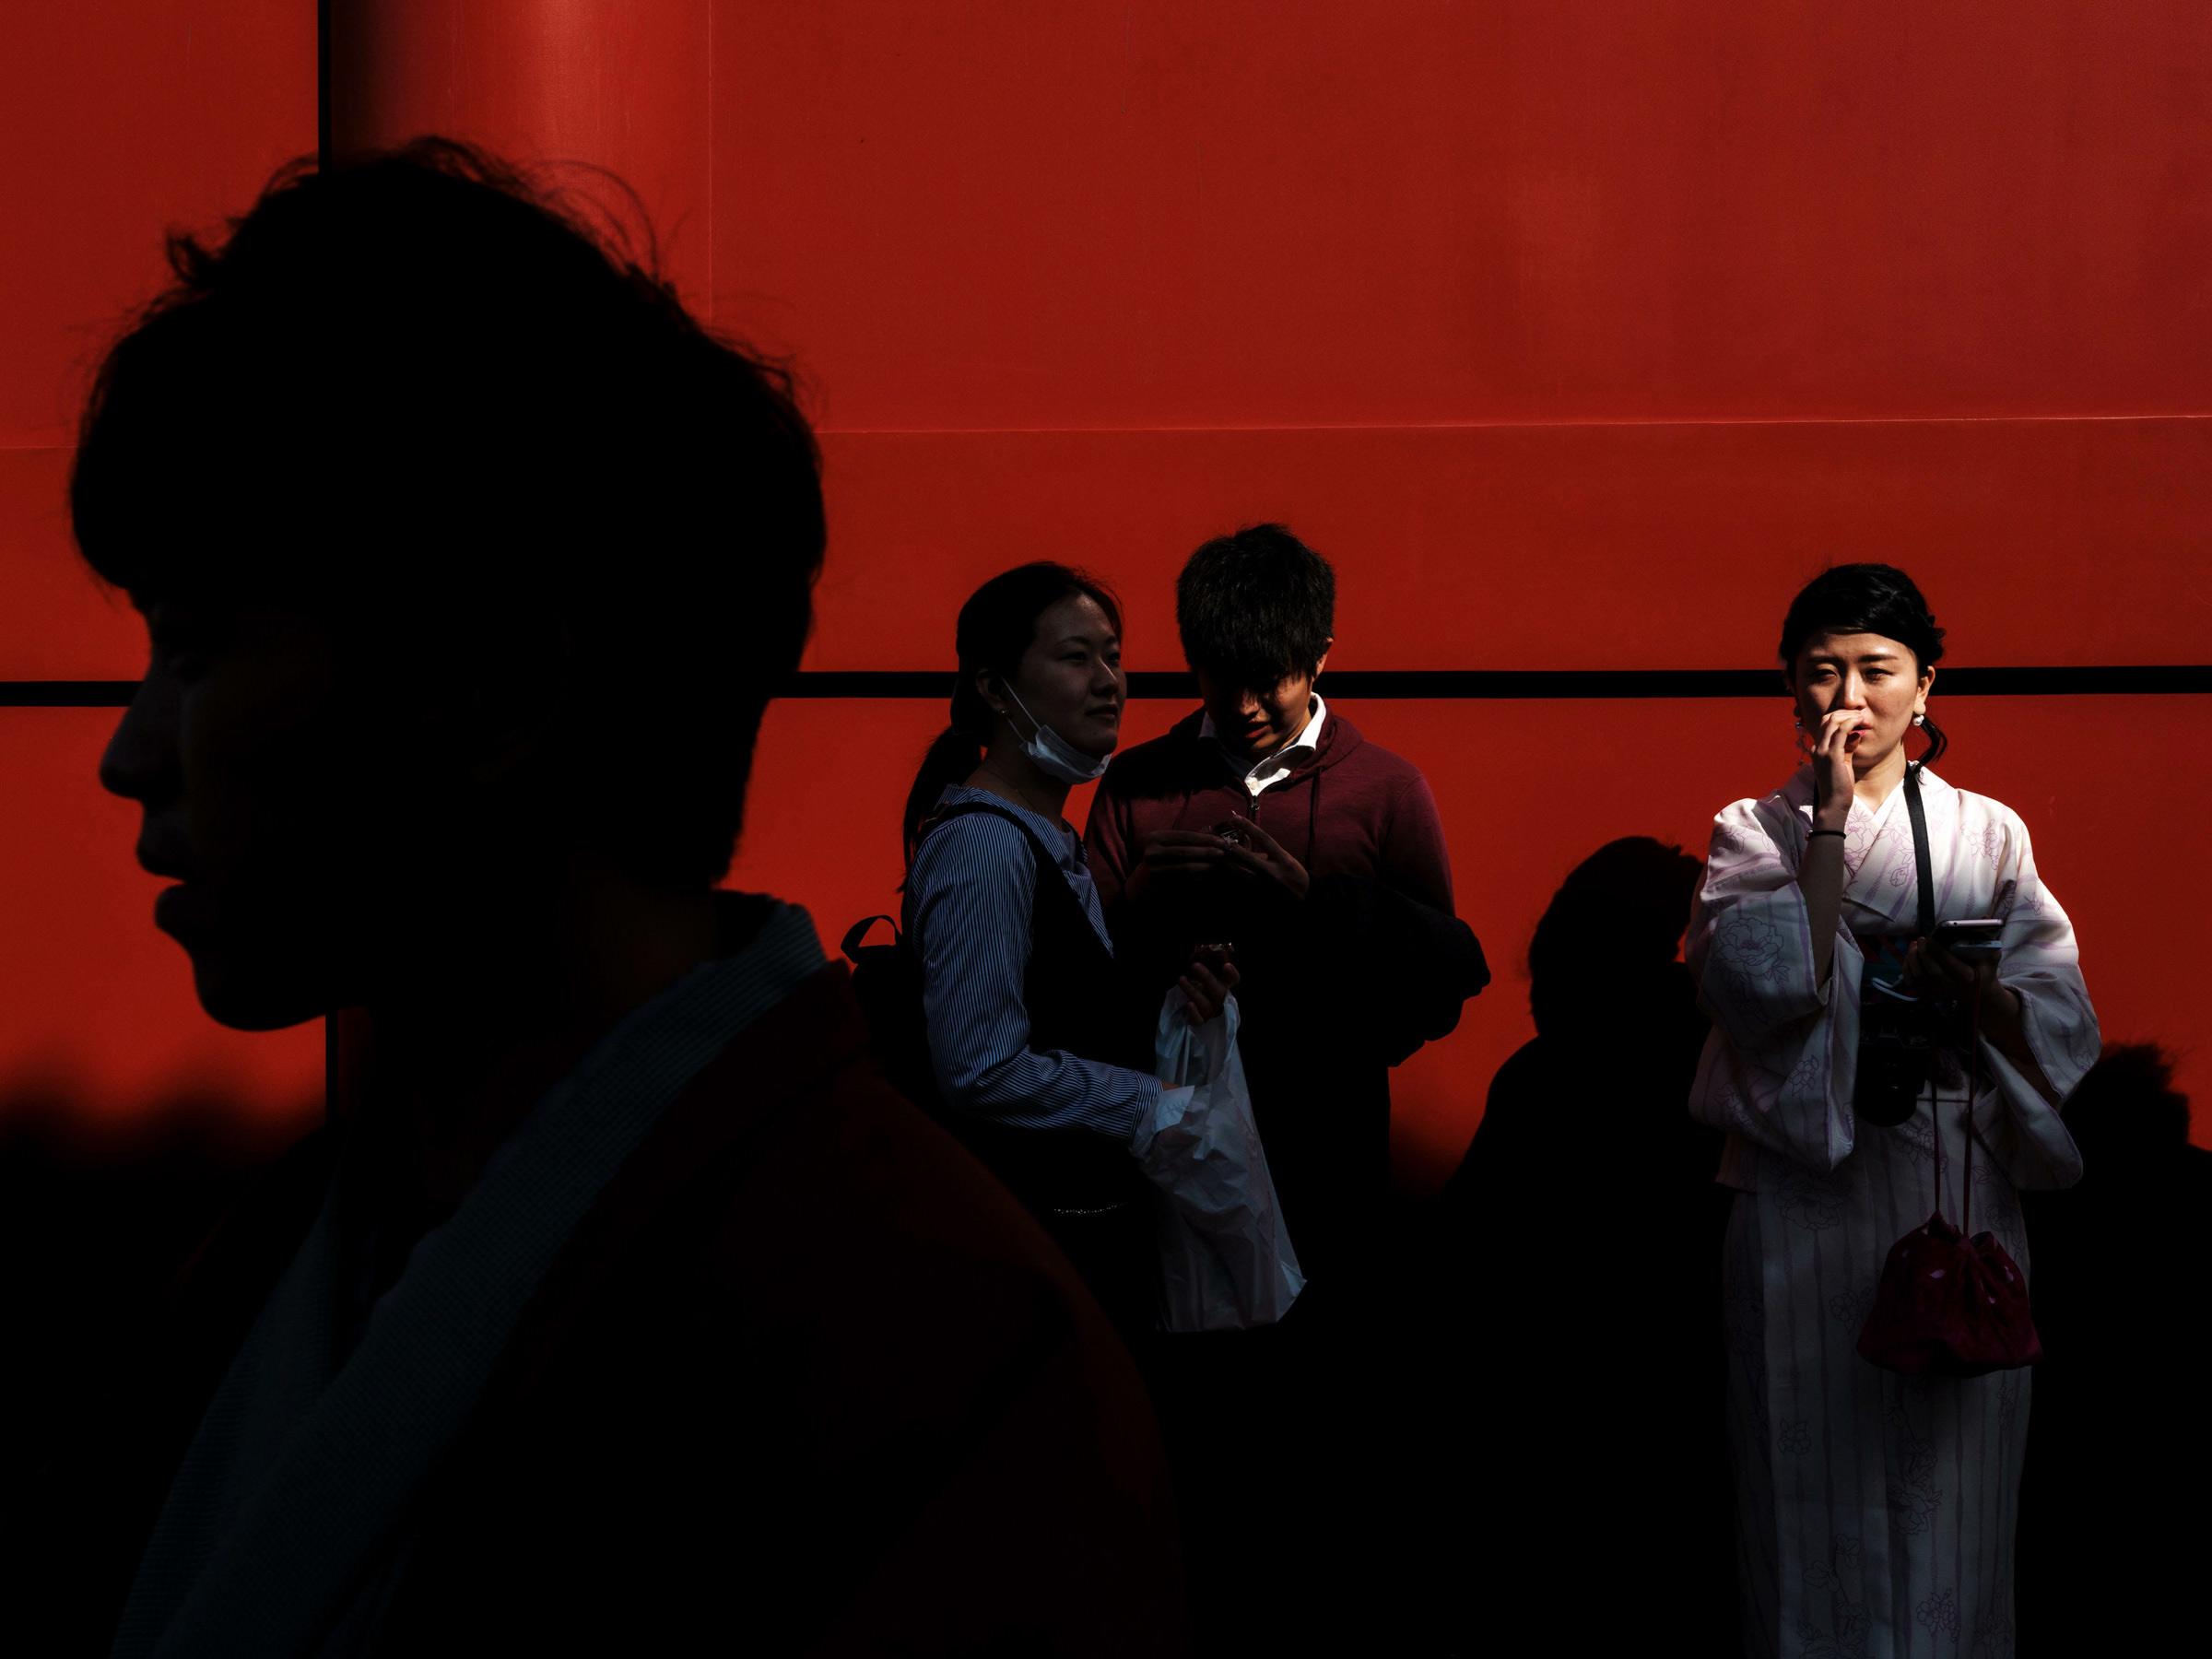 Fujifilm-GFX-Japan-Street-Photography-10